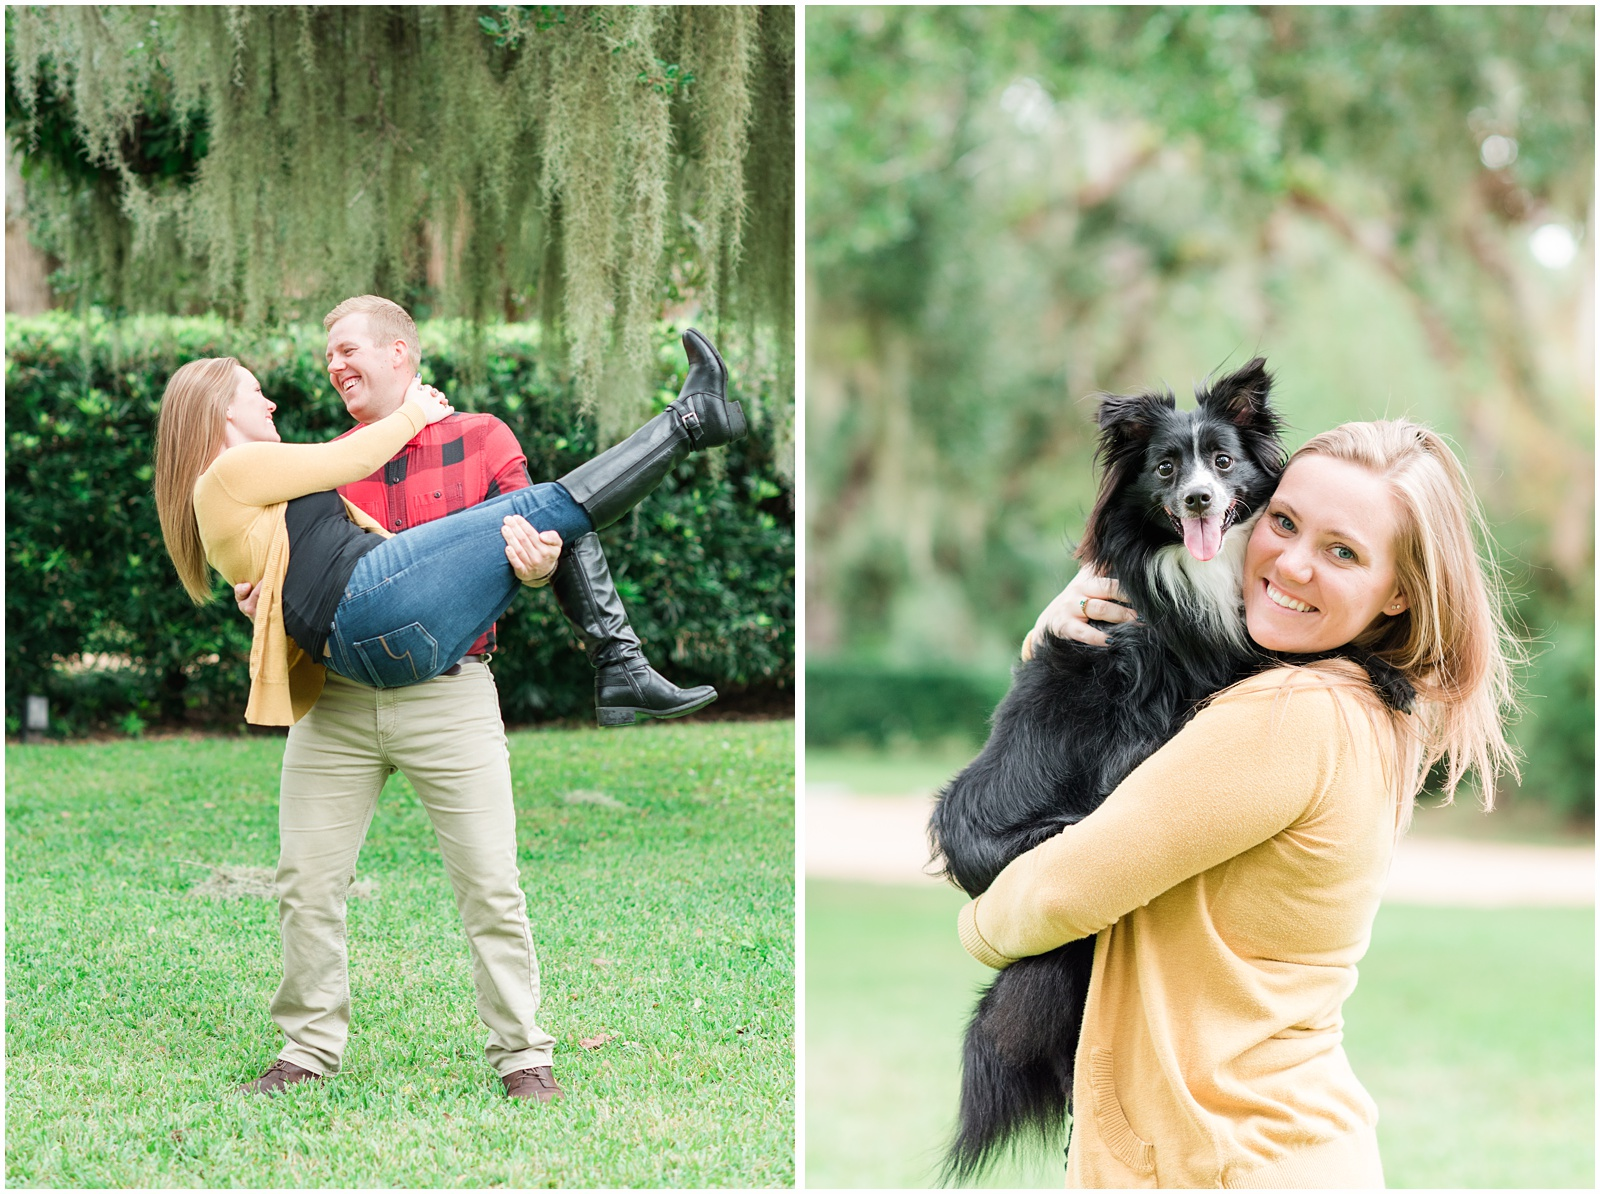 Palm Coast_Washington Oaks Garden_State Park_Engagement_Portraits_29.jpg